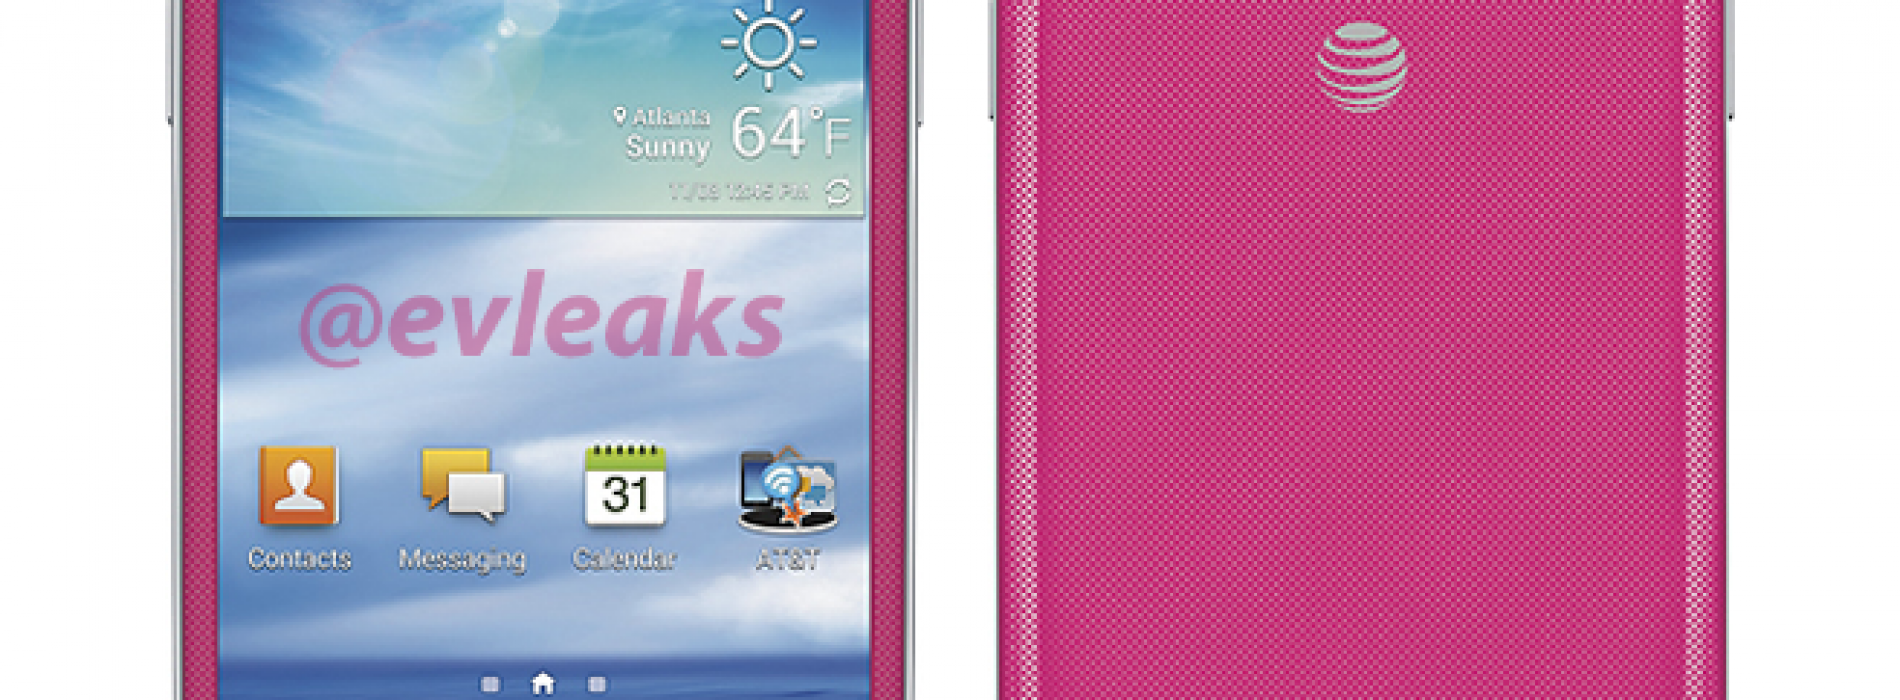 AT&T may soon introduce pink Galaxy S4 Mini